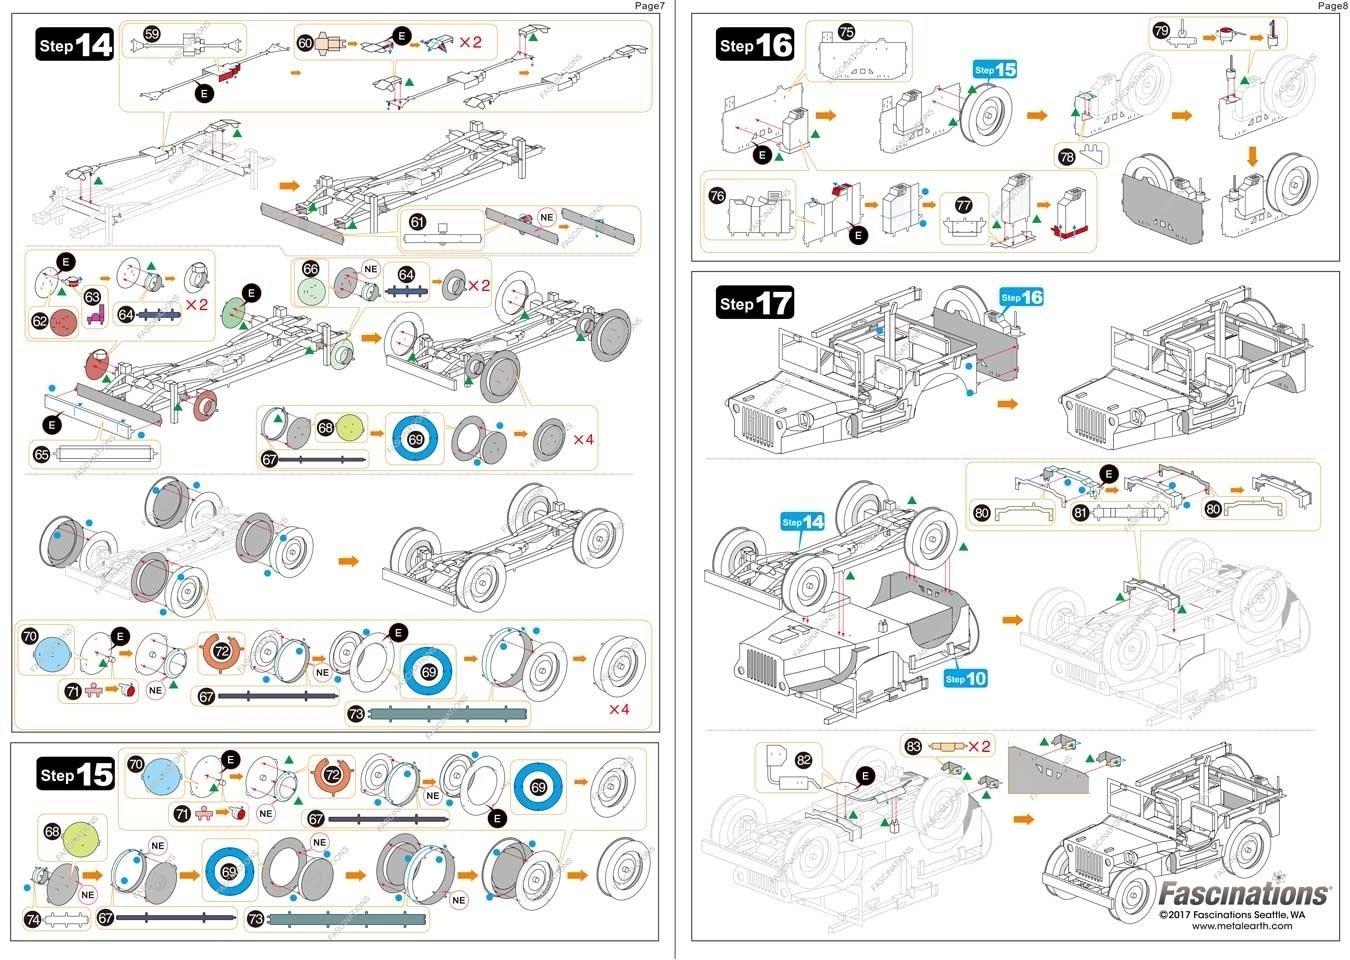 Metal Earth 3D metal Puzzle modelos de corte por l/áser Fascinations ICONX Willys Jeep Rompecabezas de metal 3D